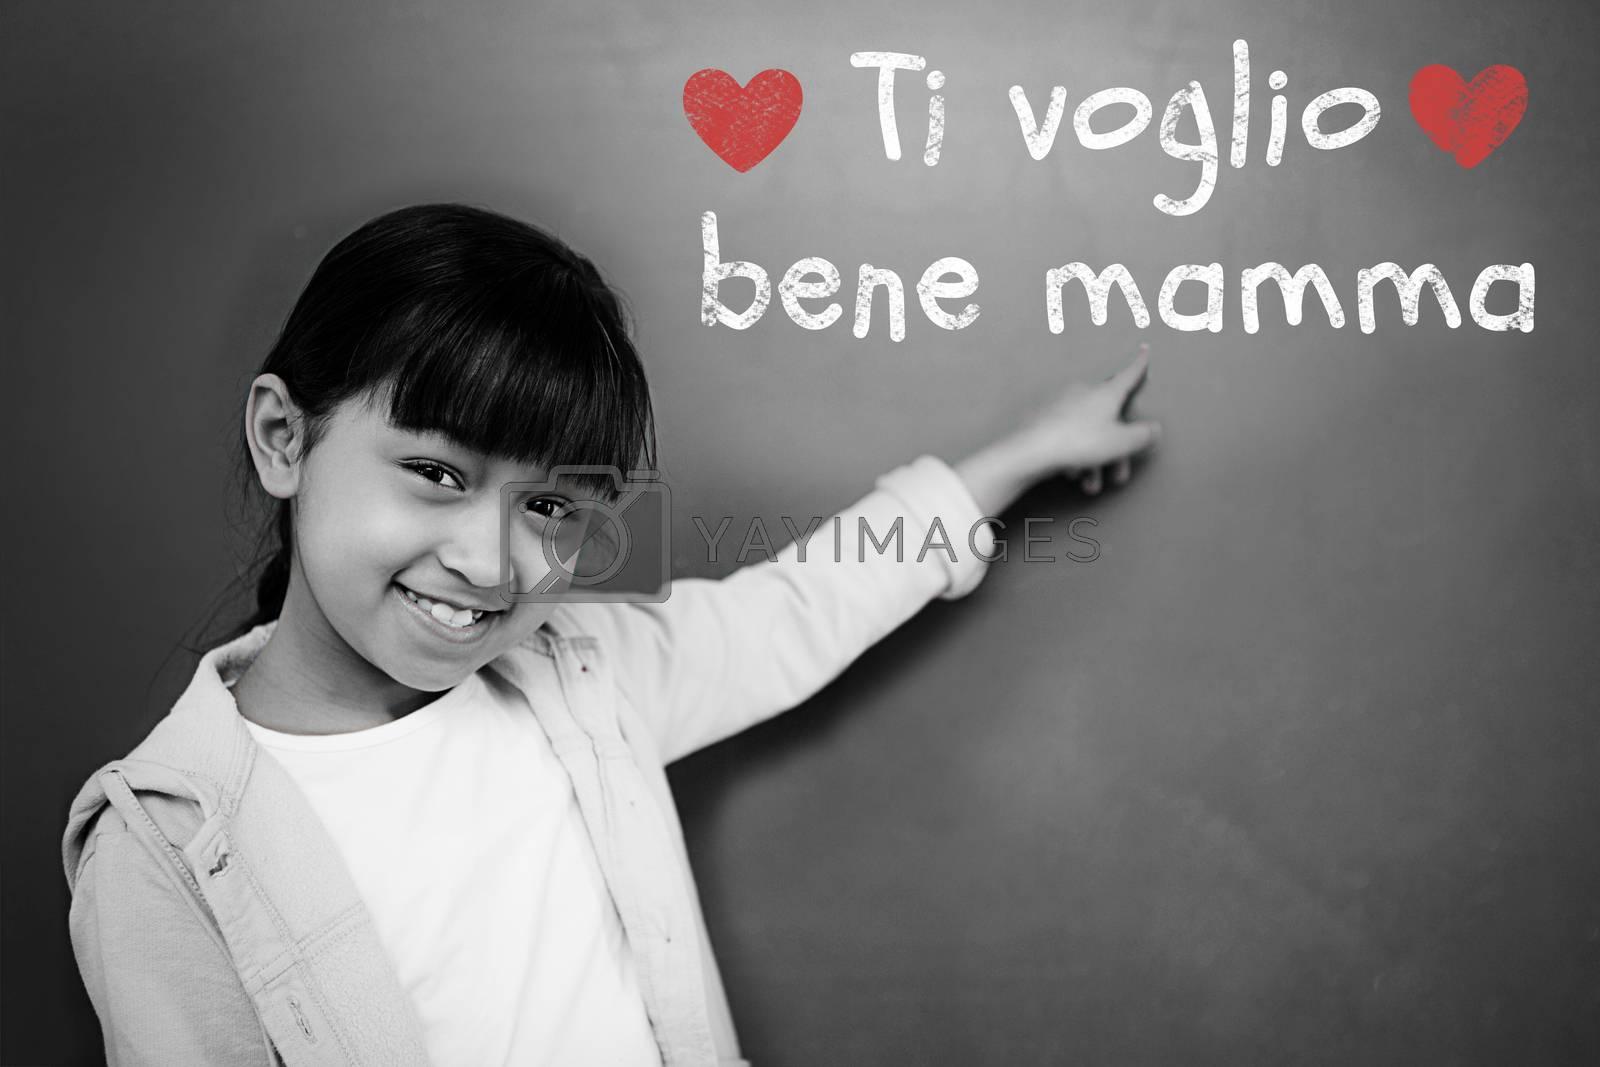 Italian mothers day message against schoolchild with blackboard